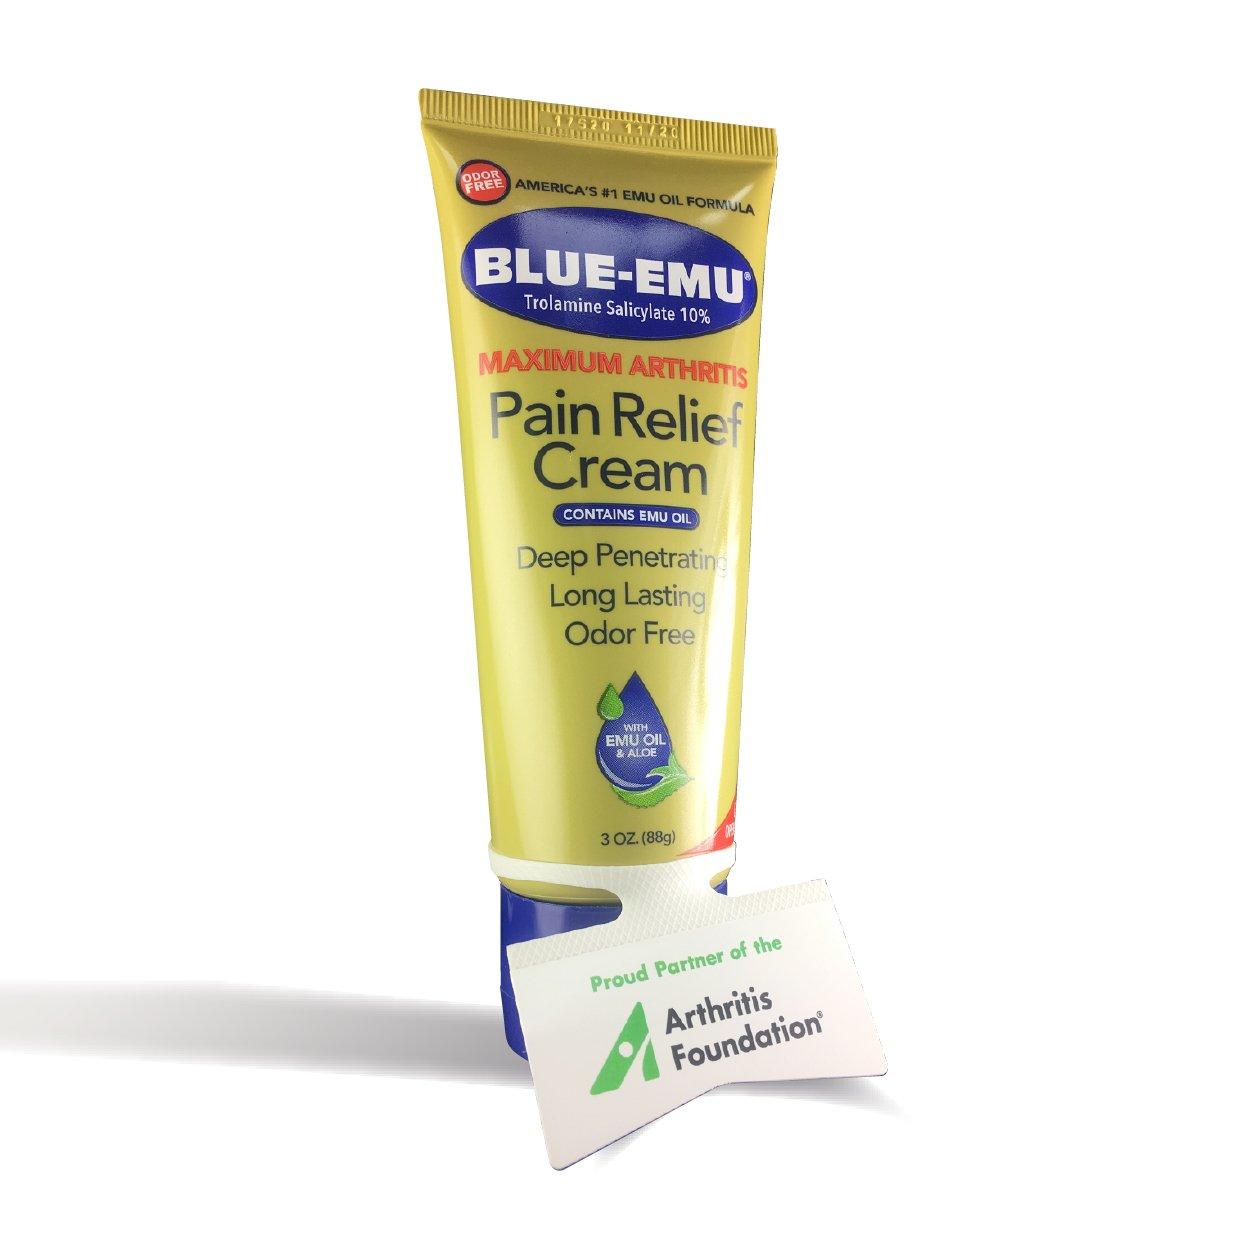 Blue Emu Maximum Arthritis Pain Relief Cream, 3 Ounce by Blue Emu